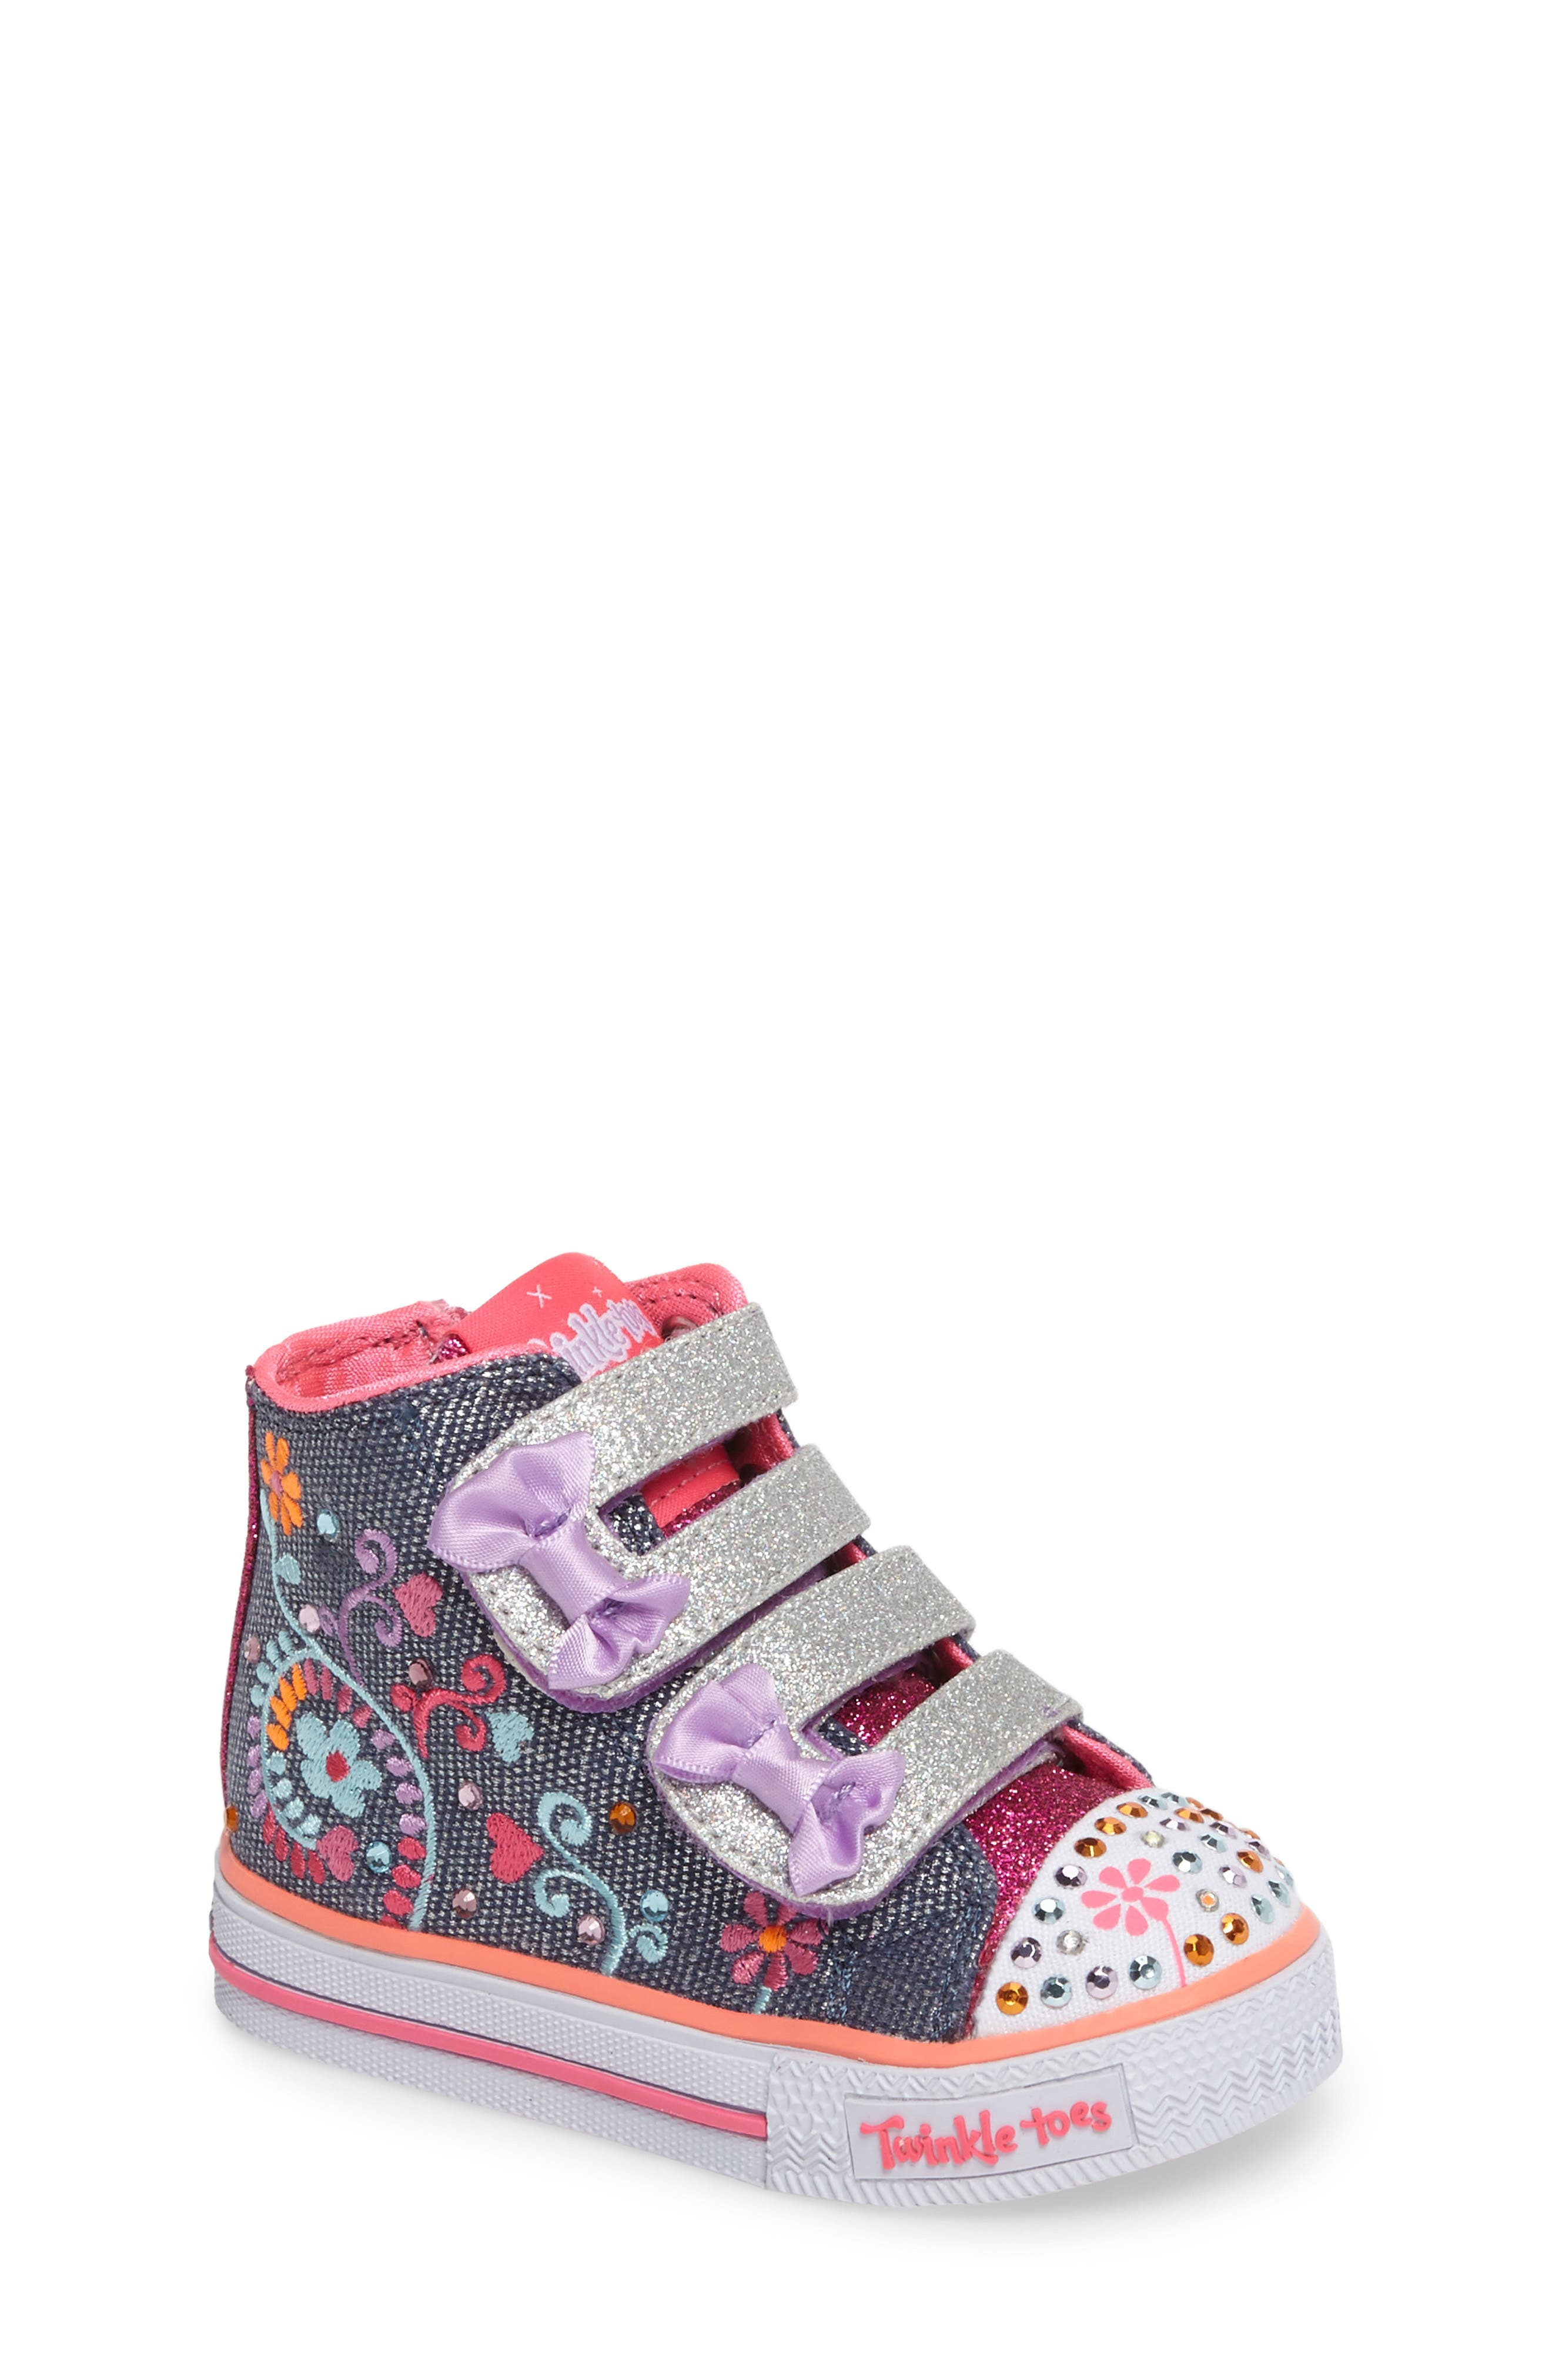 Shuffles Sneaker,                         Main,                         color,